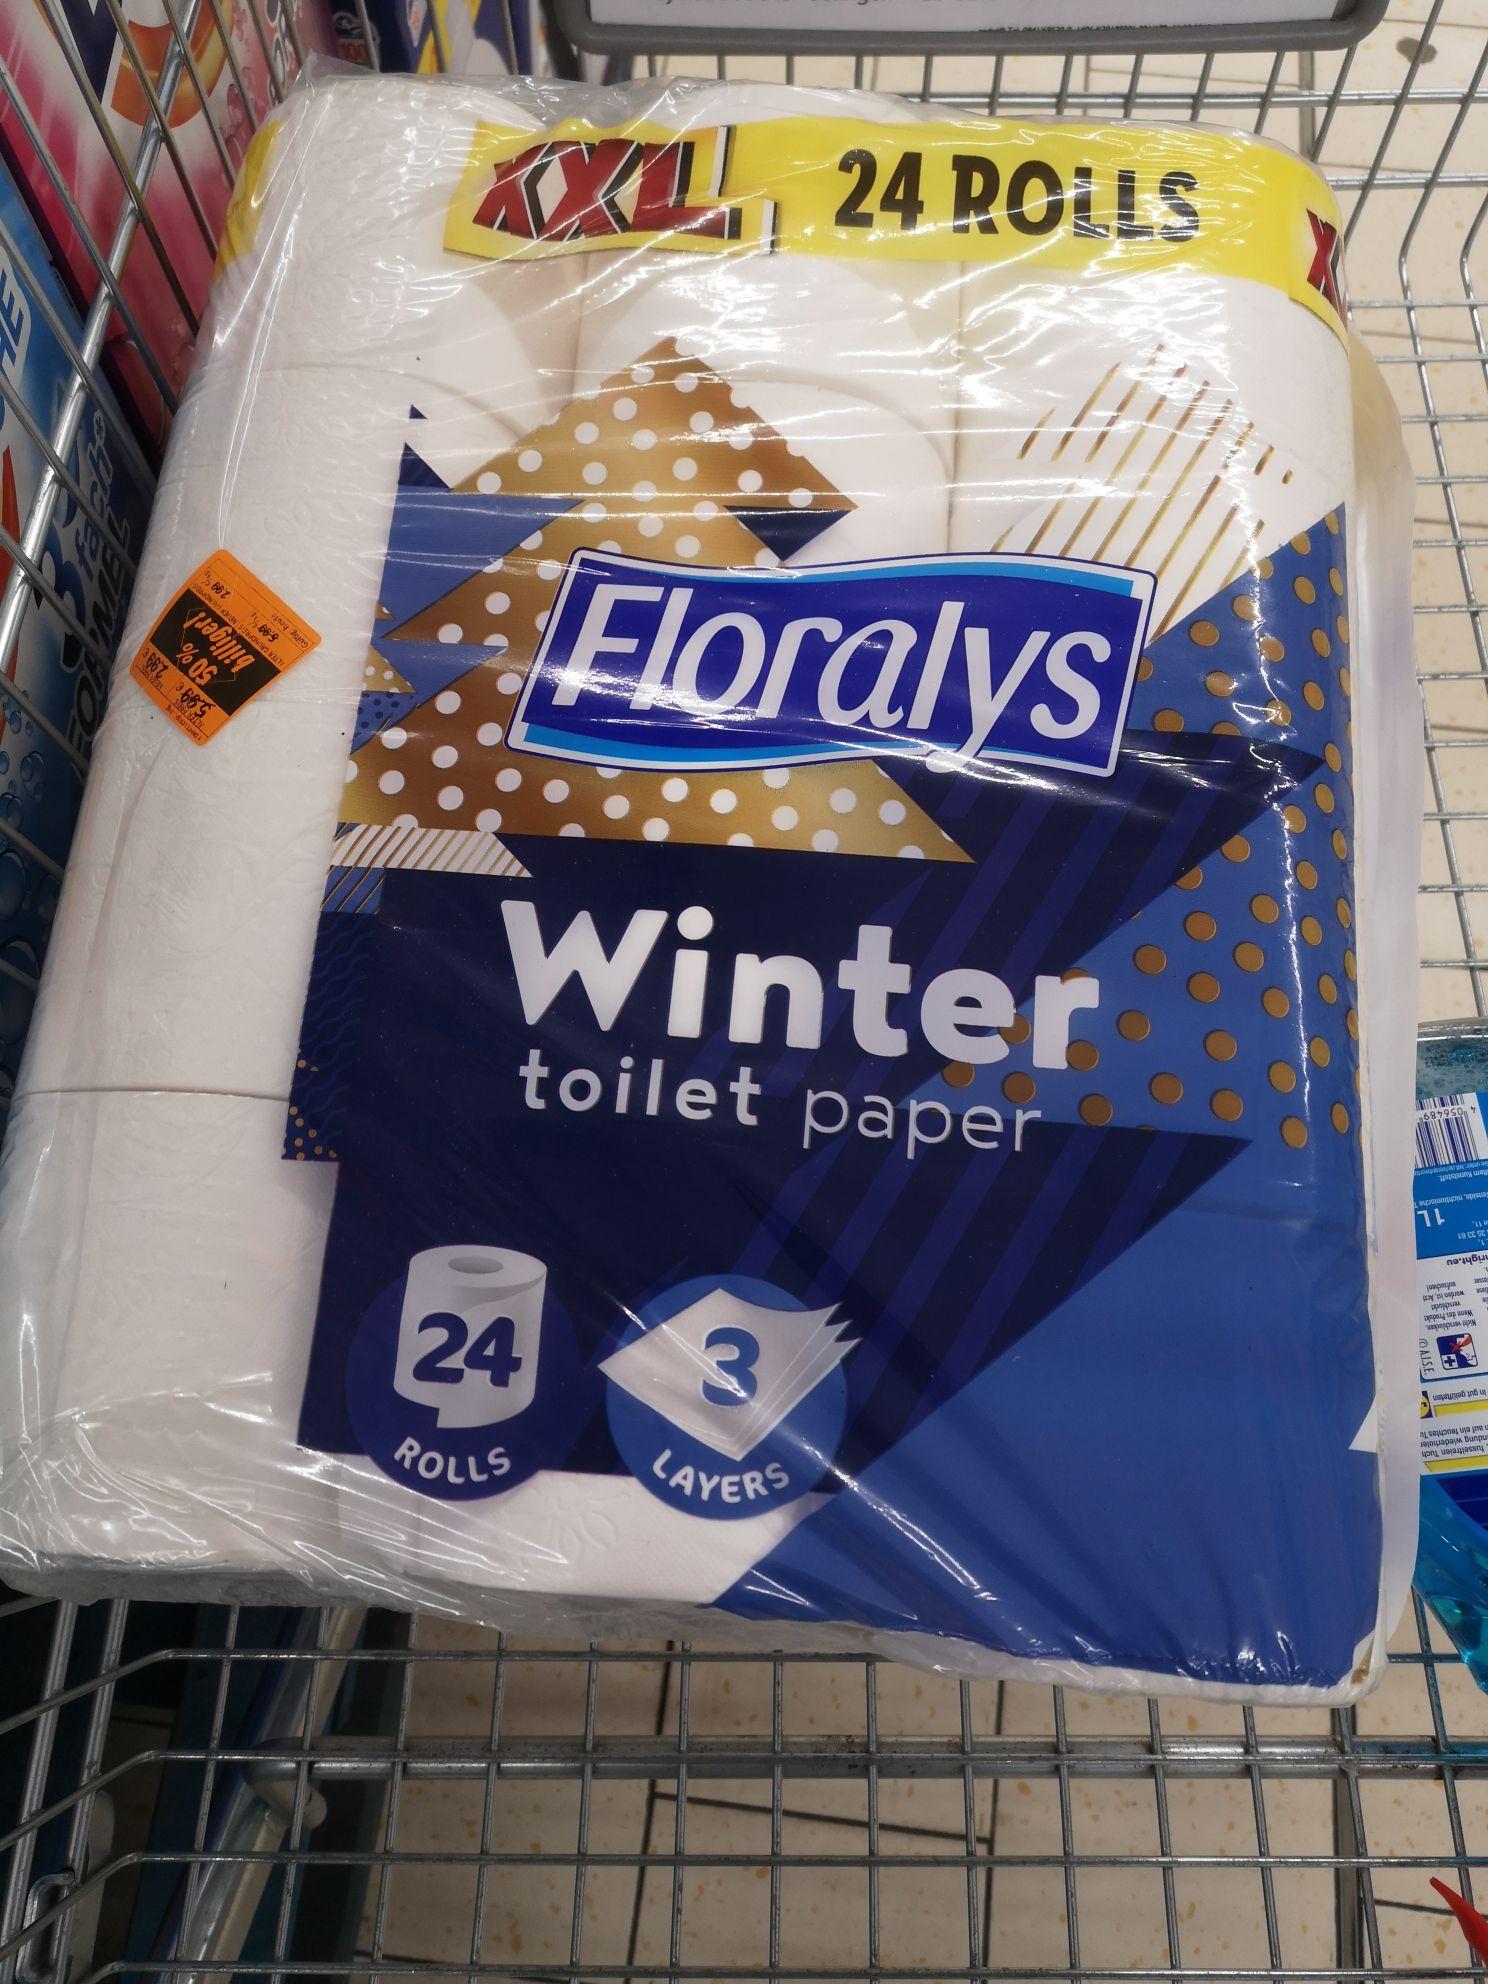 (Lokal) Floralys 3 Lagig Winter Toilettenpapier 24 Rollen 2,99€ statt 5,99 Lidl in Haan Ost